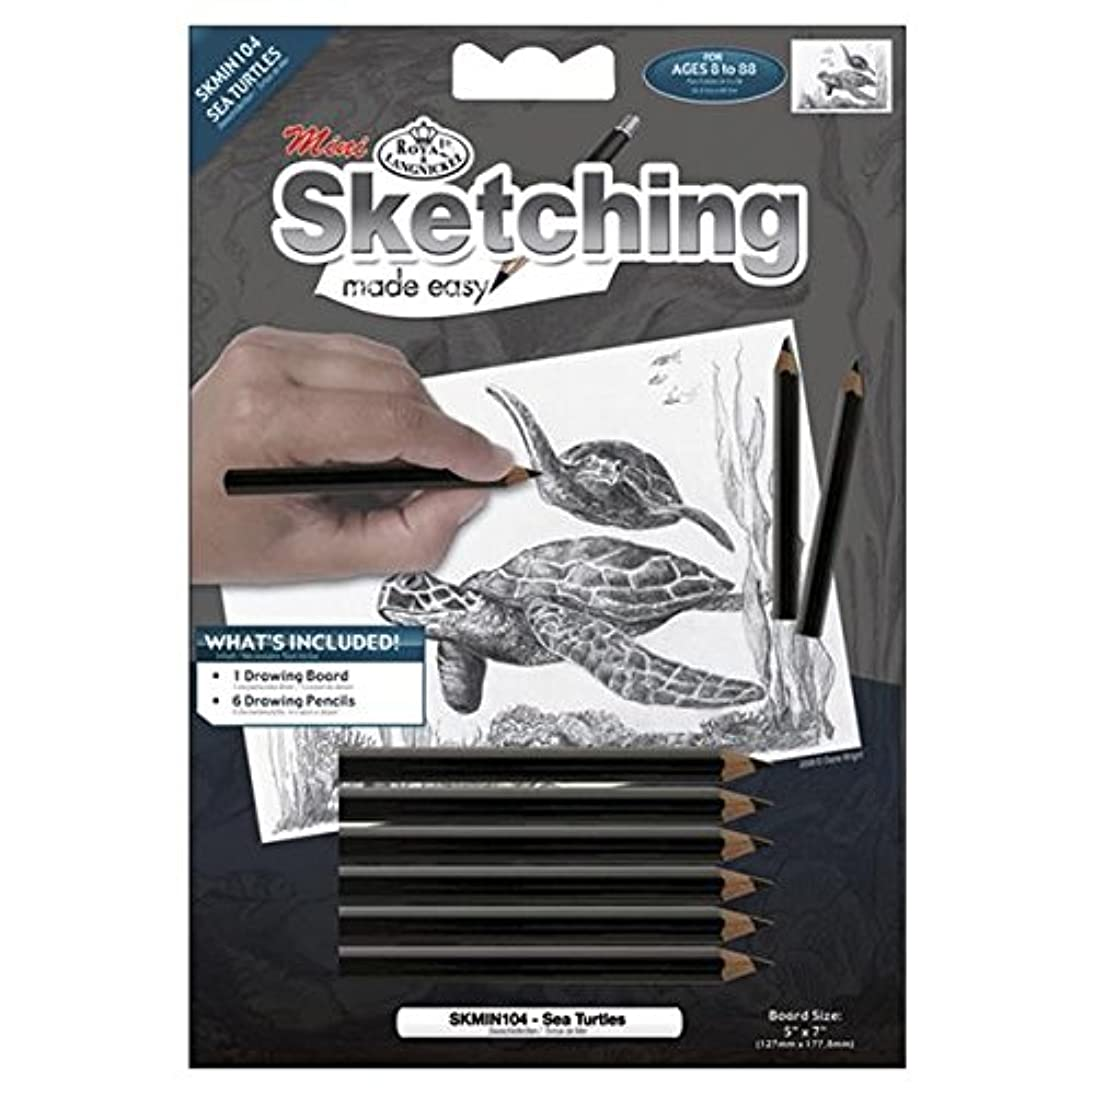 Royal Brush Mini Sketching Made Easy Kit, 5 by 7-Inch, Sea Turtles